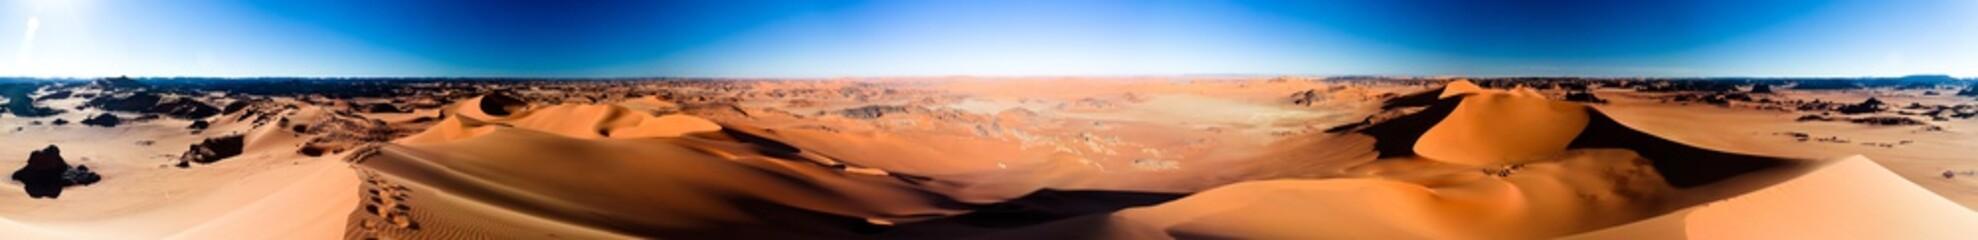 360 sunset panoramic view to Tin Merzouga dune at Tassili nAjjer national park in Algeria